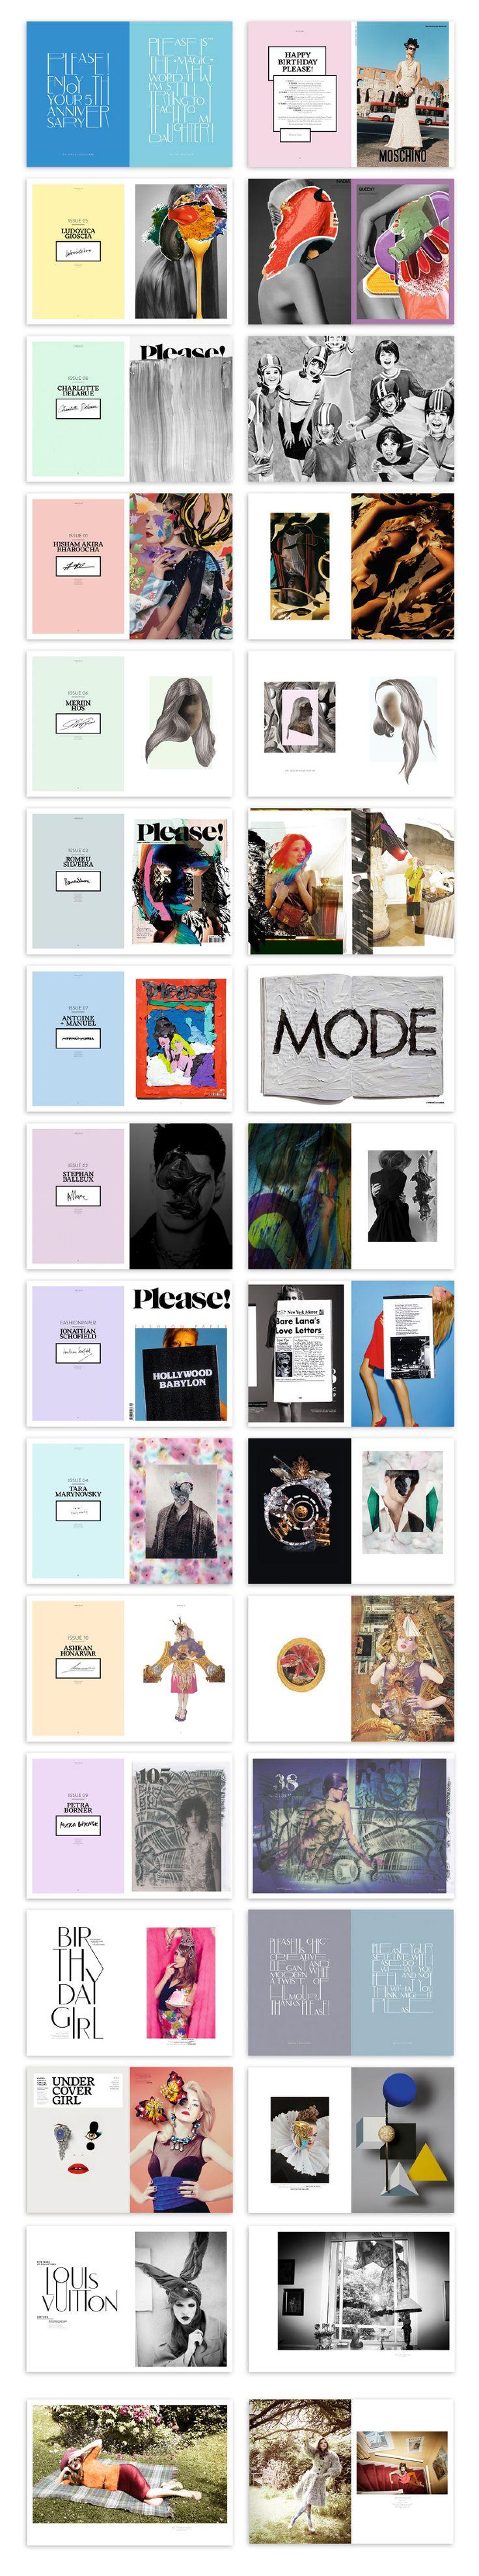 PLEASE! MAGAZINE - Leslie David